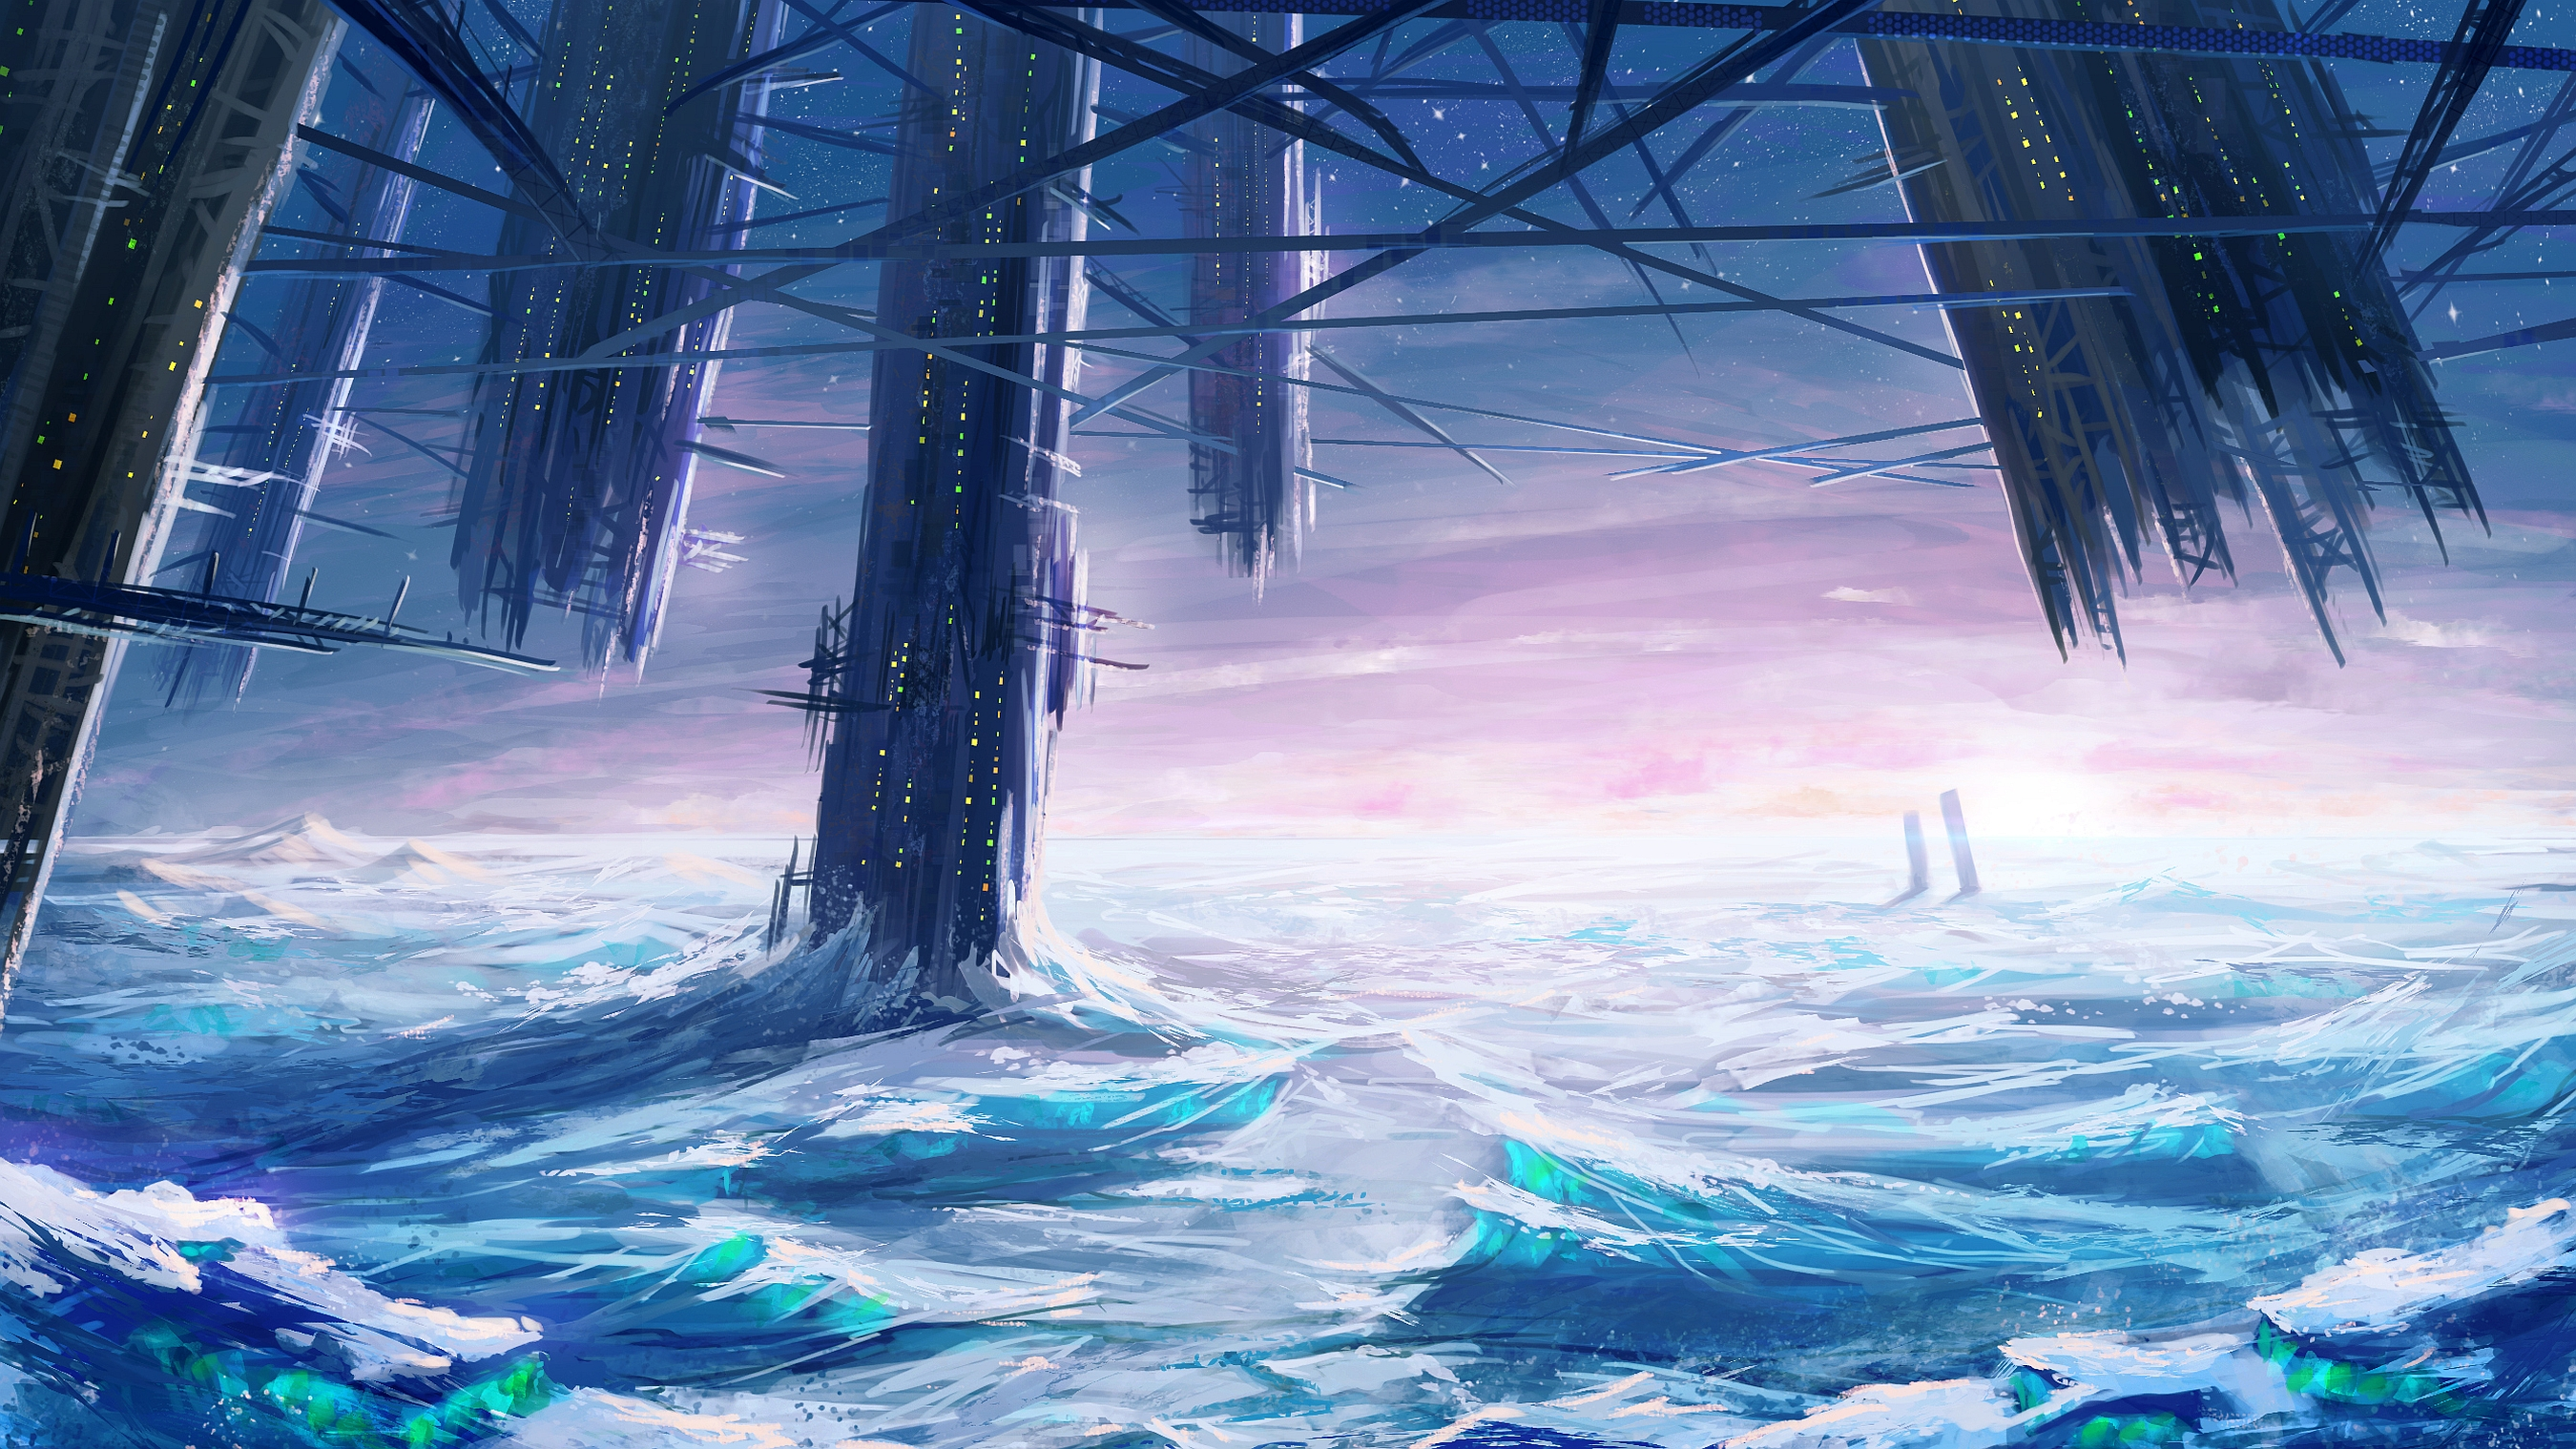 fantasy landscape wallpaper widescreen